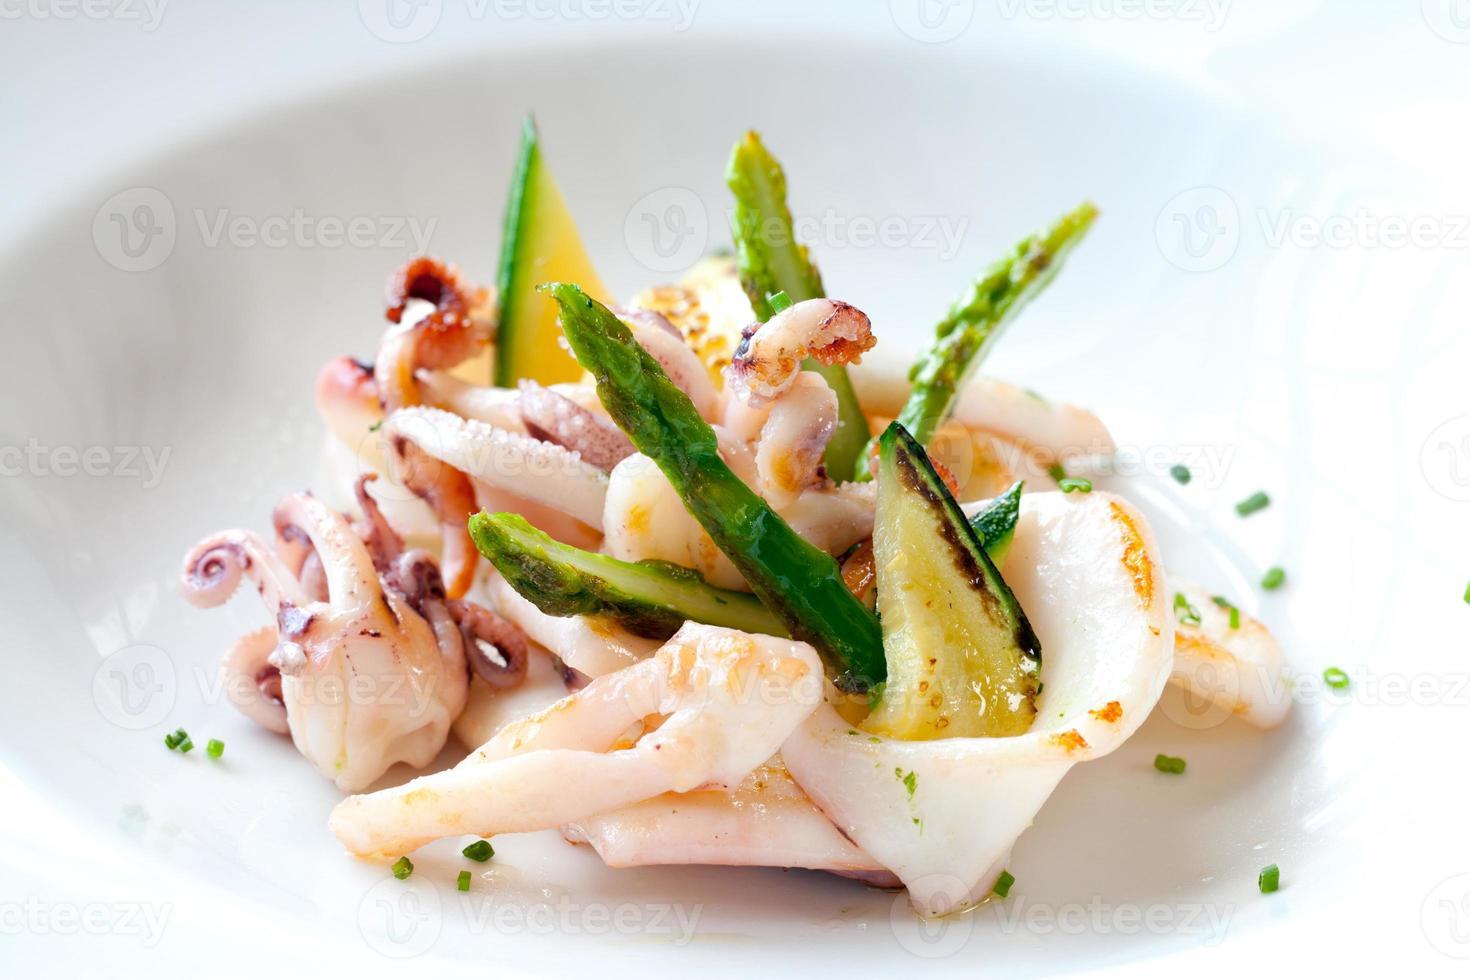 Grilled calamari with green asparagus. photo